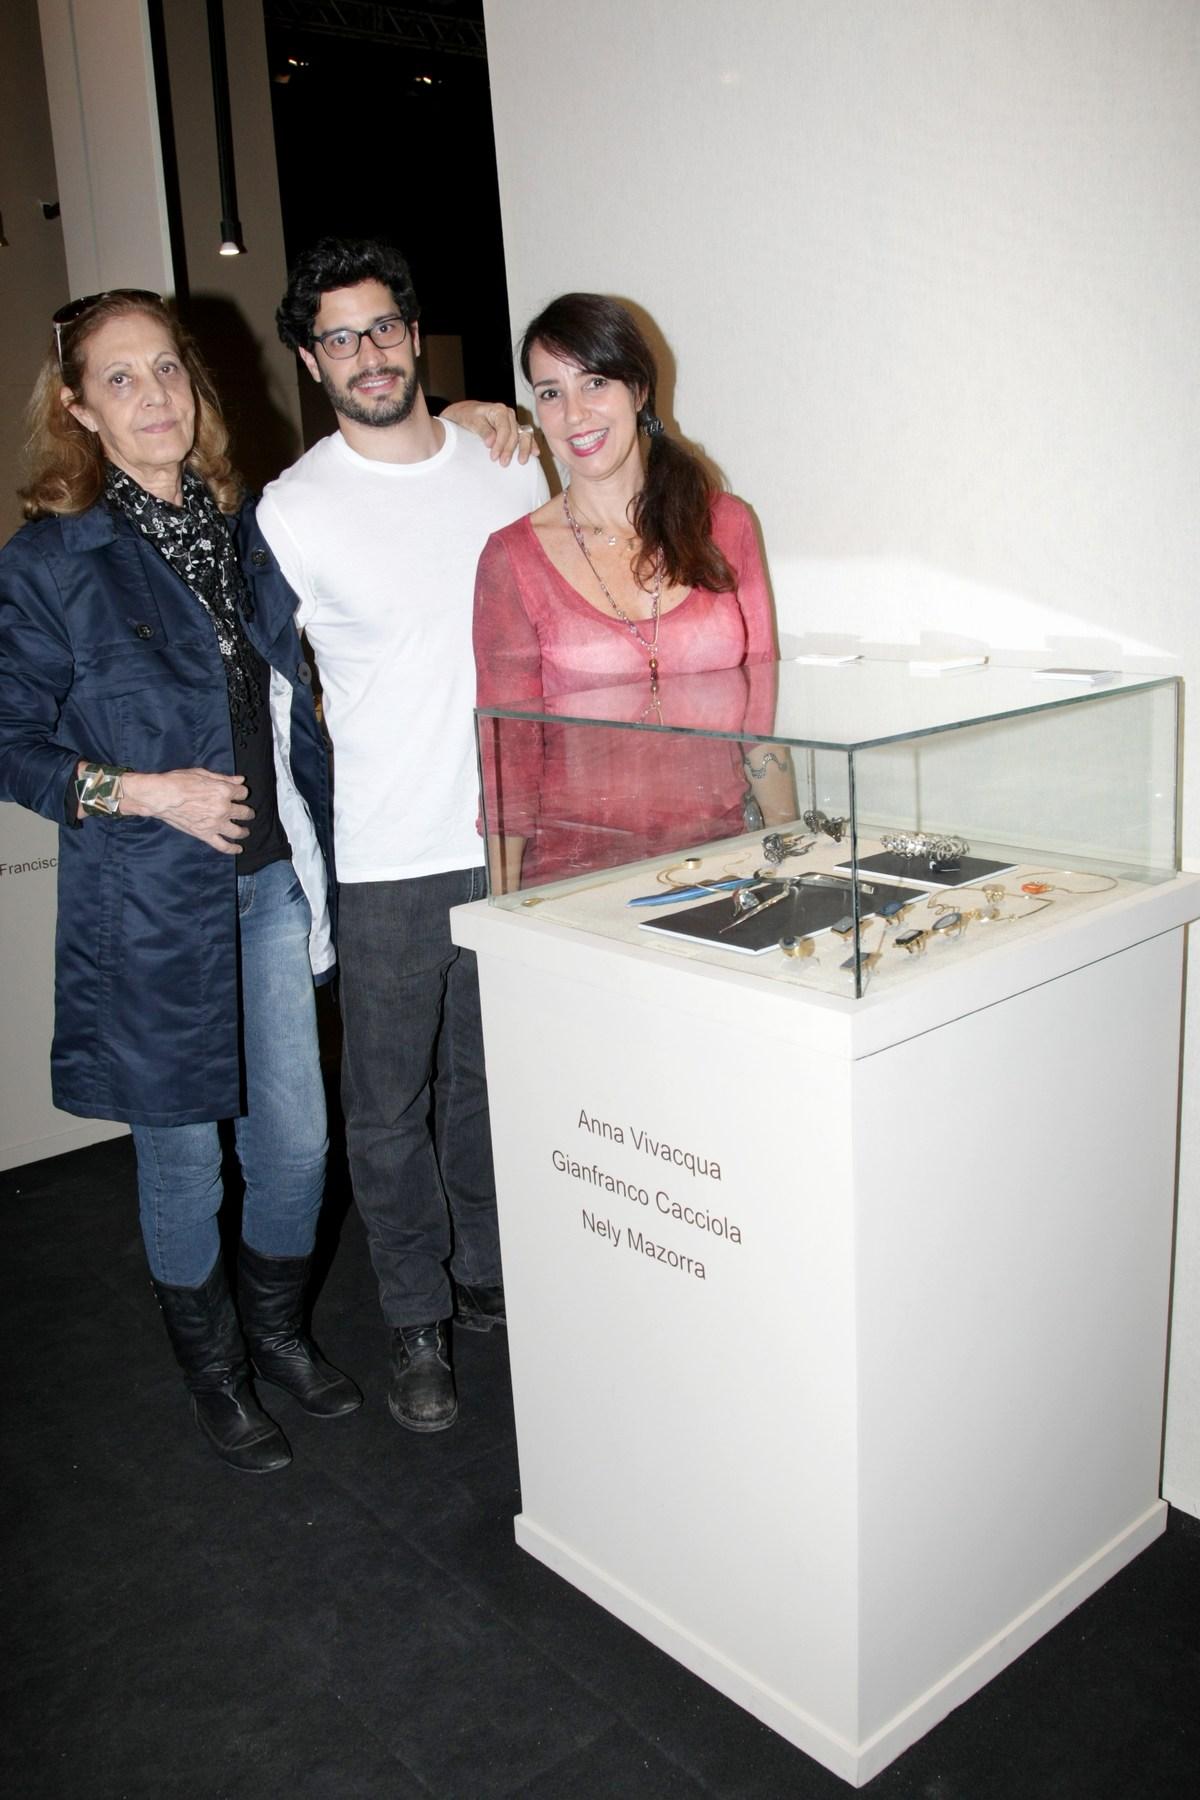 joia brasil -Nely Mazorra, Gianfranco Cacciola e Anna Vivacqua